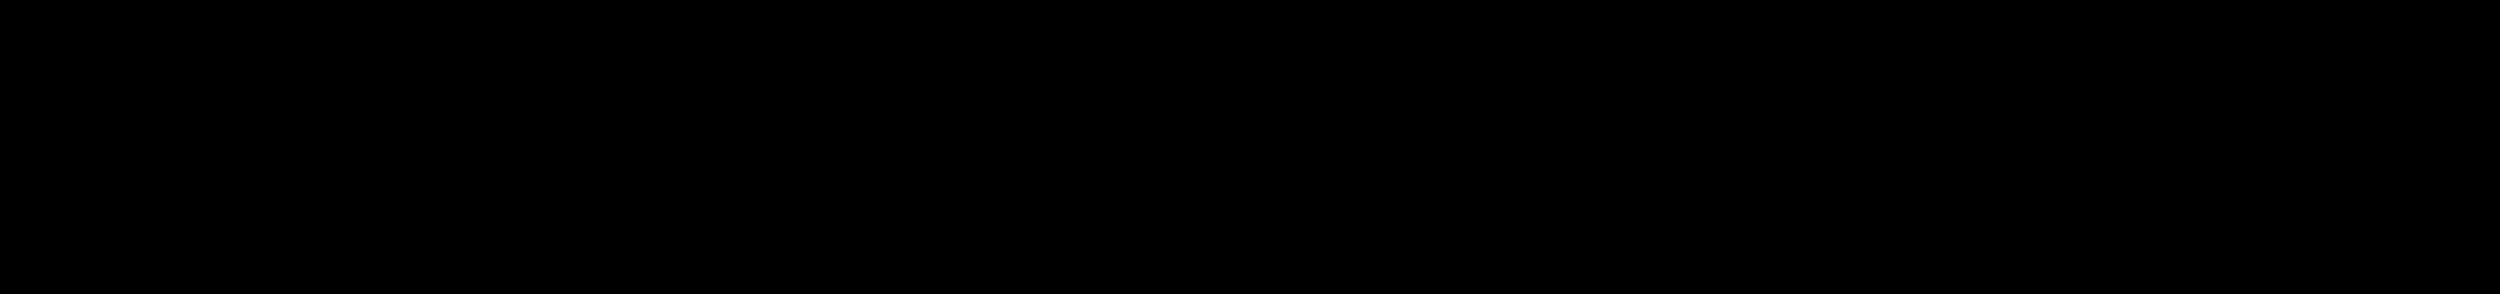 Tiffany__Co_logo_wordmark_logotype.png